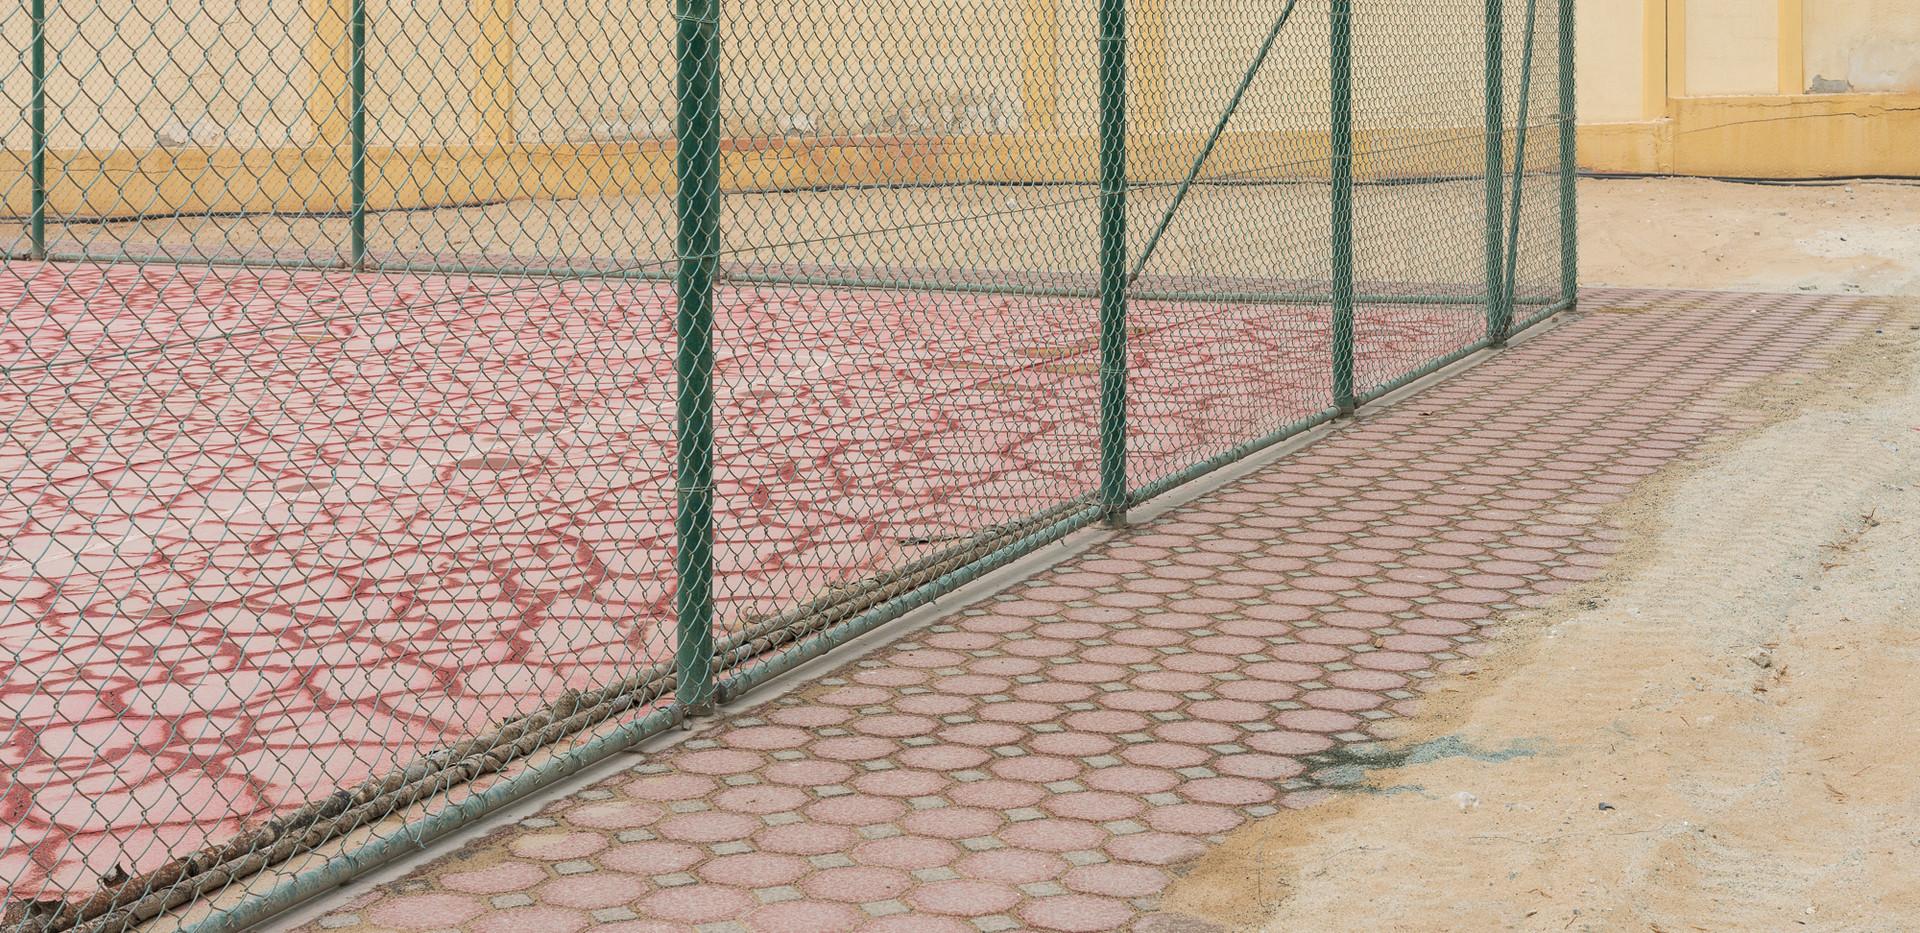 Sharjah clay court